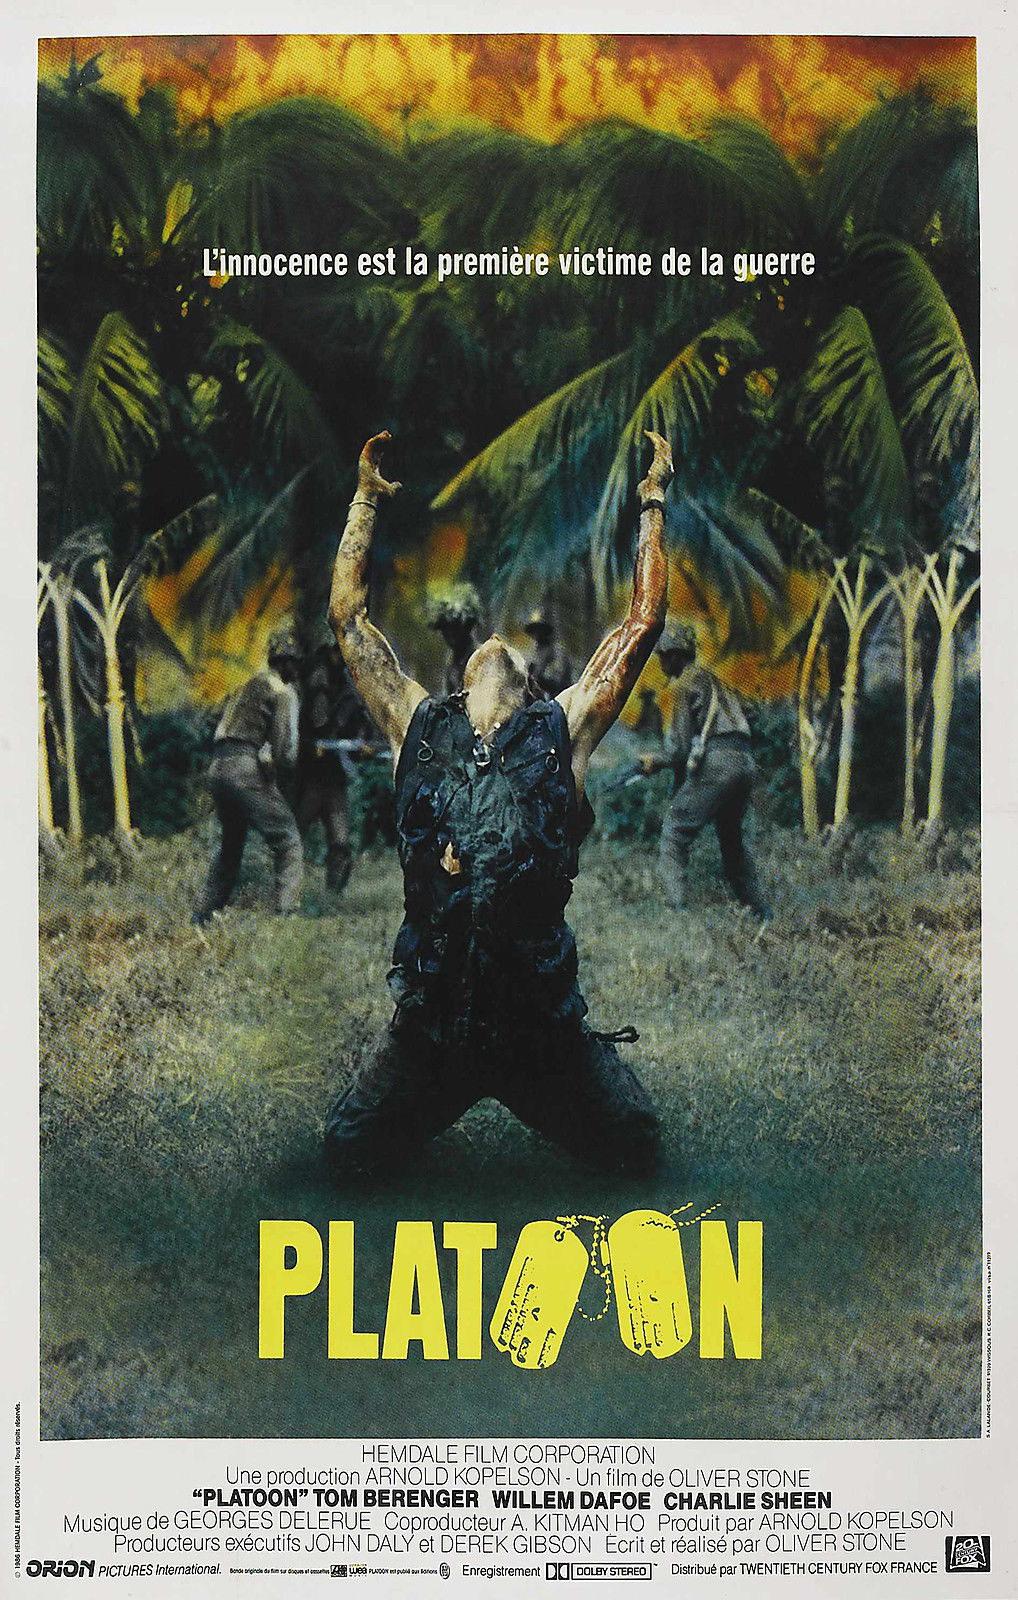 73699-PLATOON-1986-Charlie-Sheen-Veitnam-Oliver-Stone-Wall-Print-Poster-Affiche